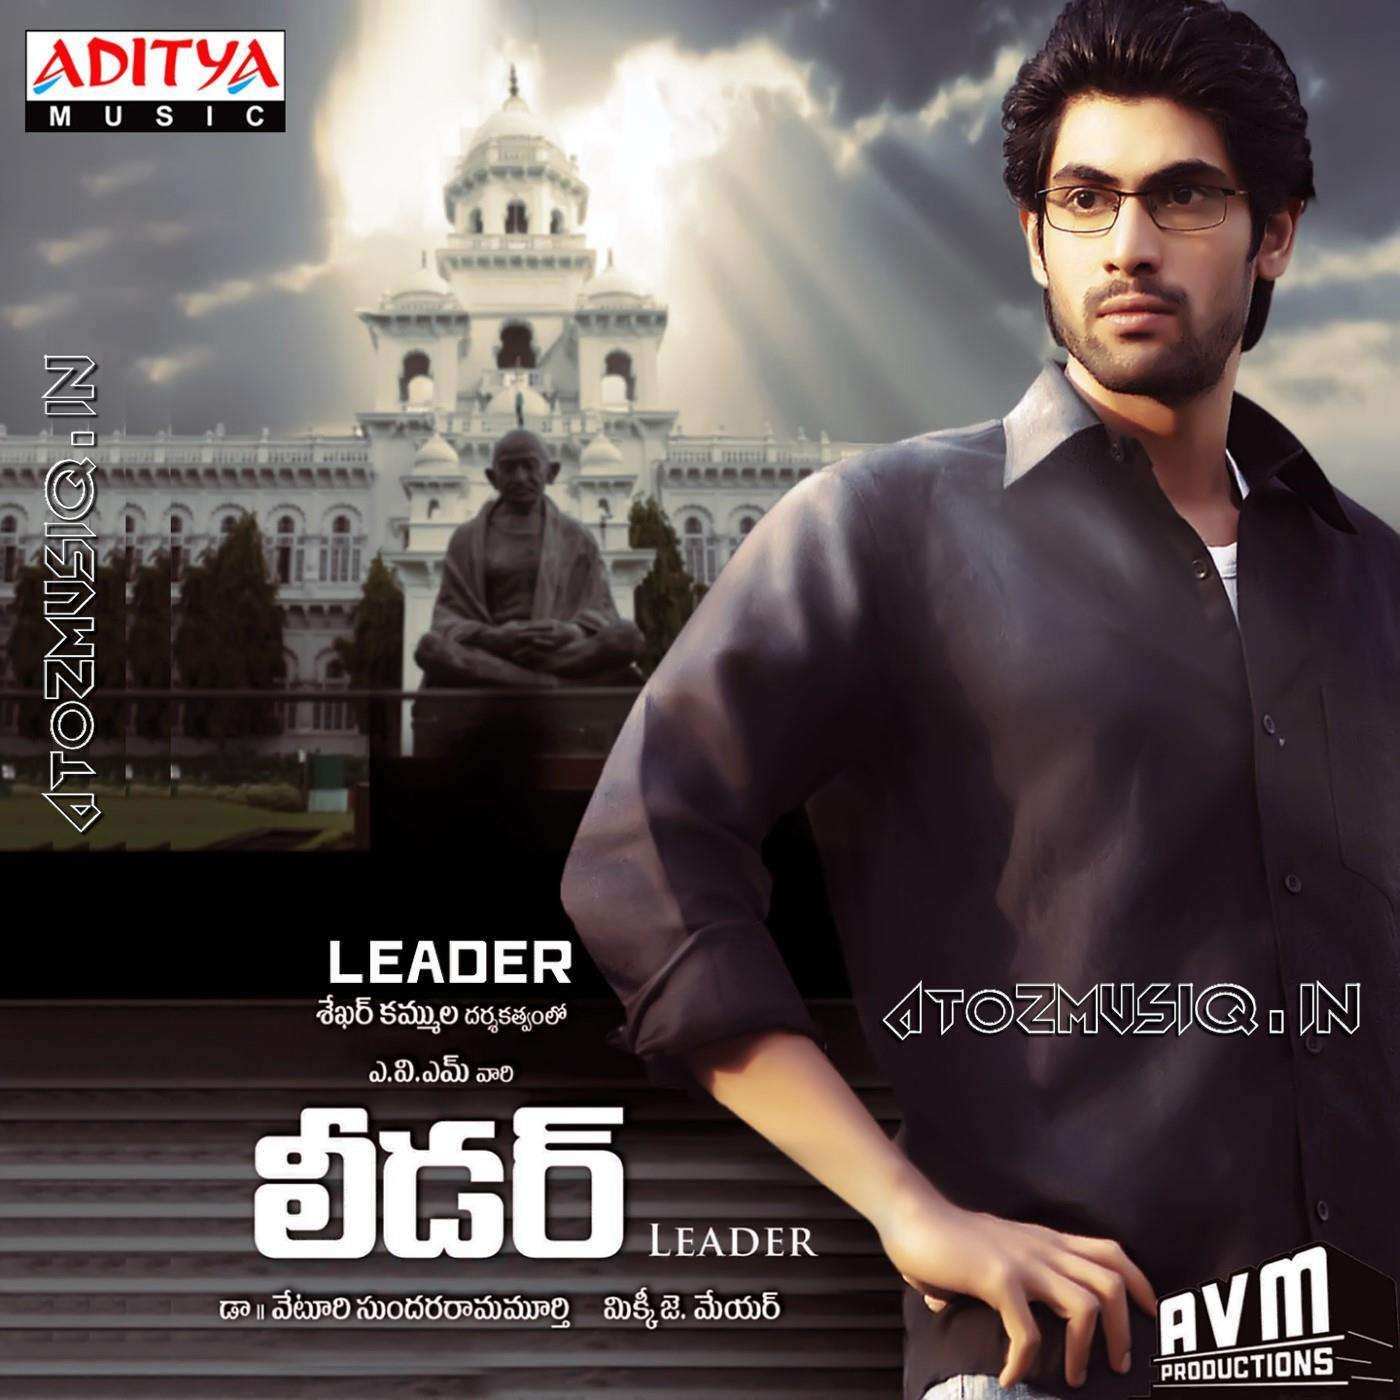 Leader 2010 Telugu Itunes M4a Mp3 Song Songs Leader